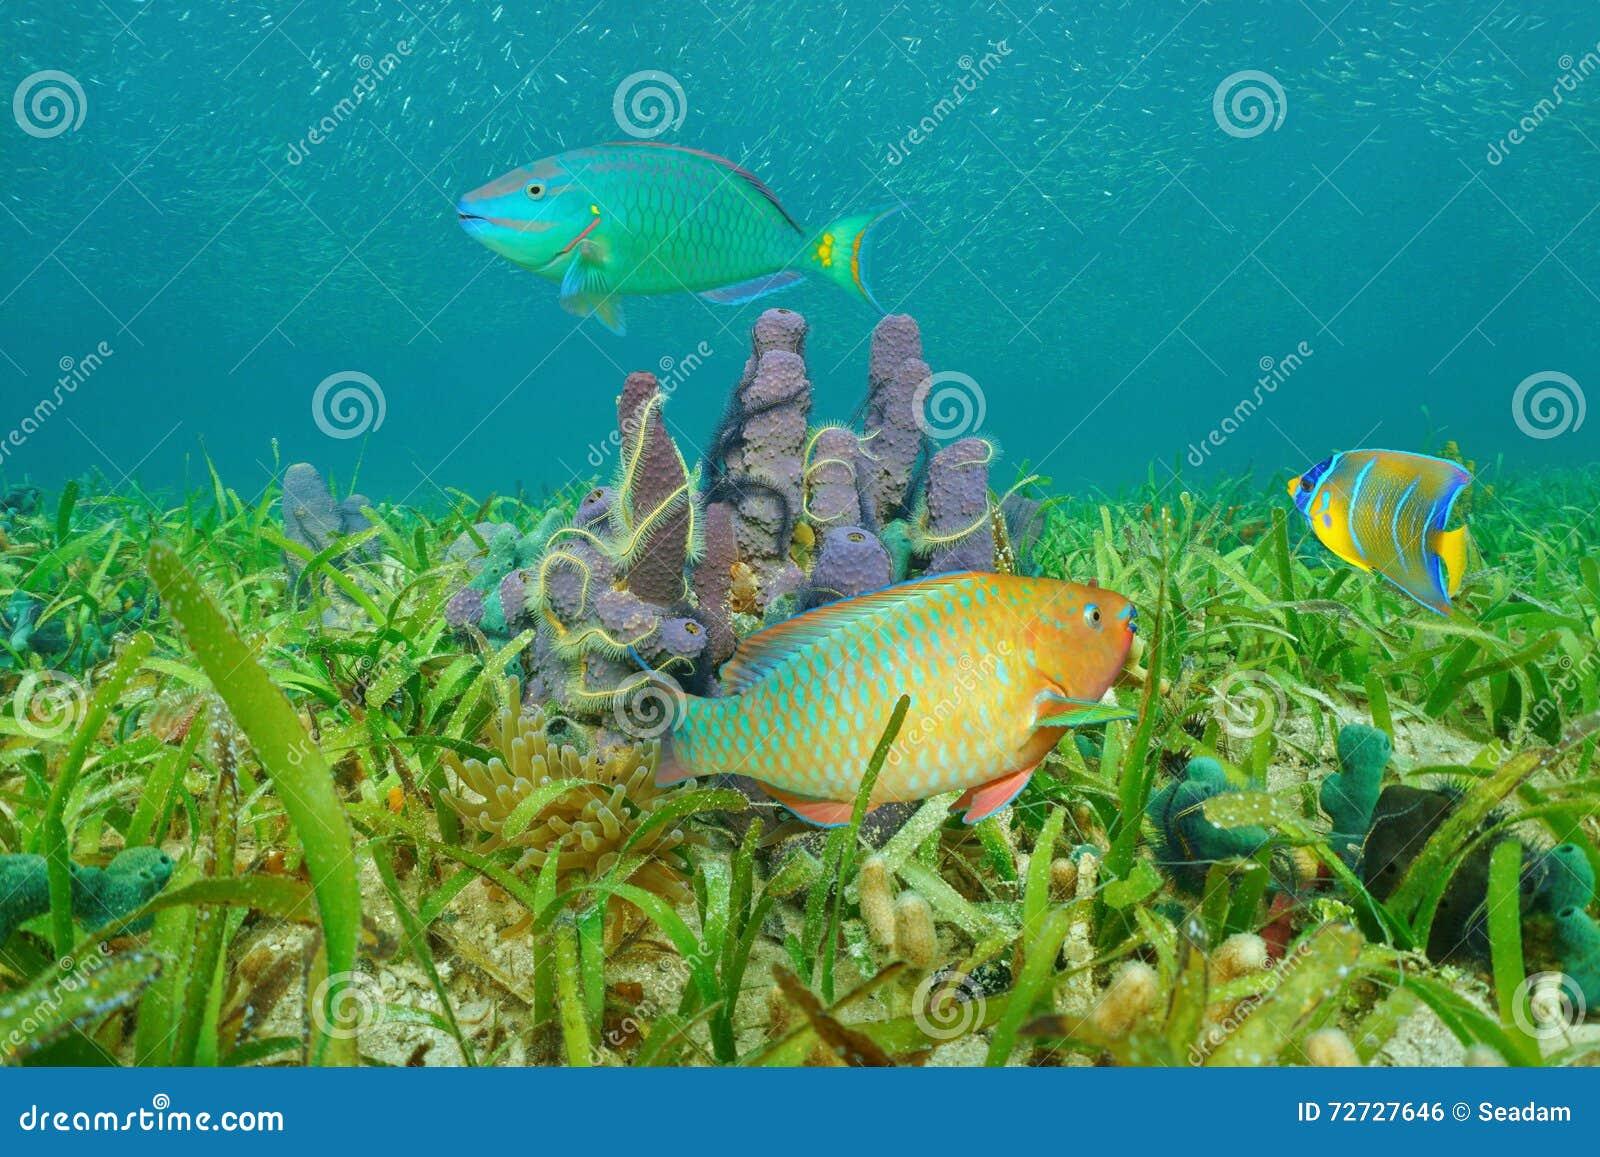 Marine Life On Seabed Colorful Fish Caribbean Sea Stock Photo ...